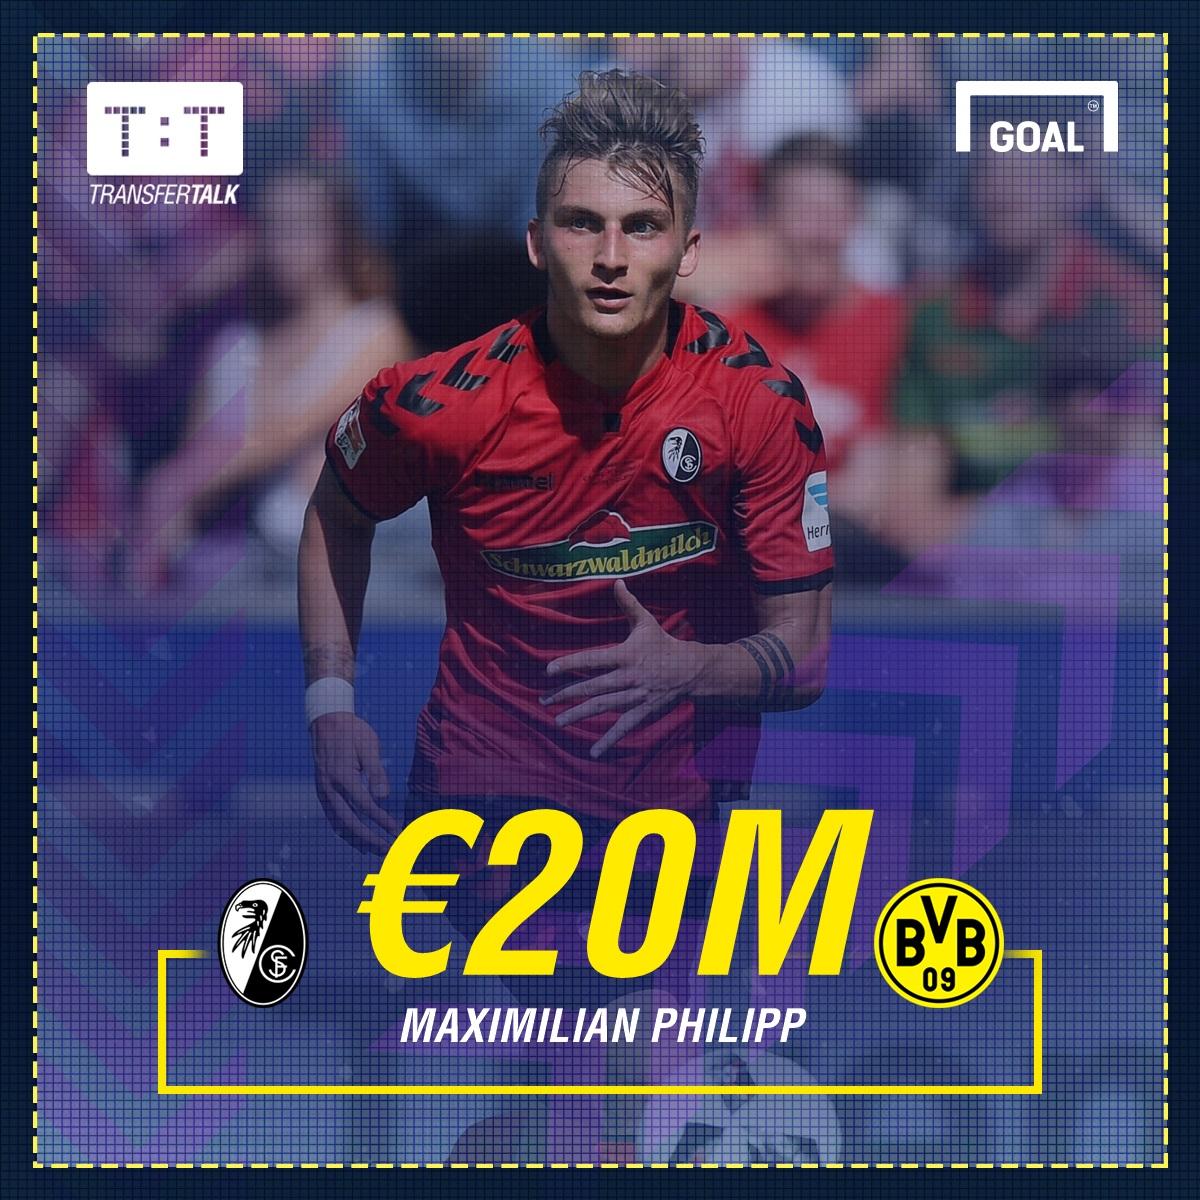 GFX Maximilian Philipp Dortmund Transfer